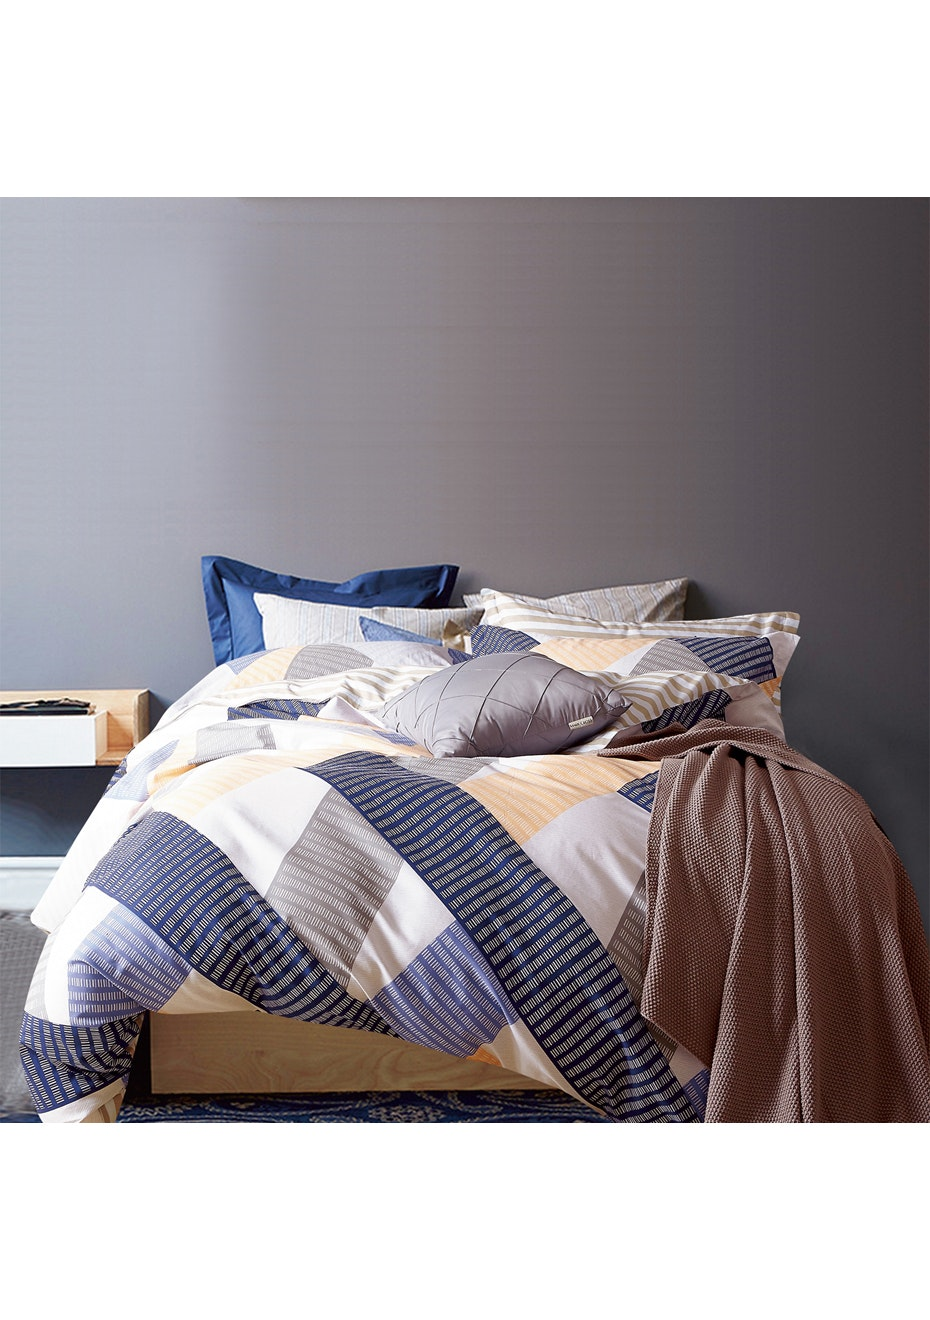 Terrigal Quilt Cover Set - Reversible Design - 100% Cotton - Double Bed